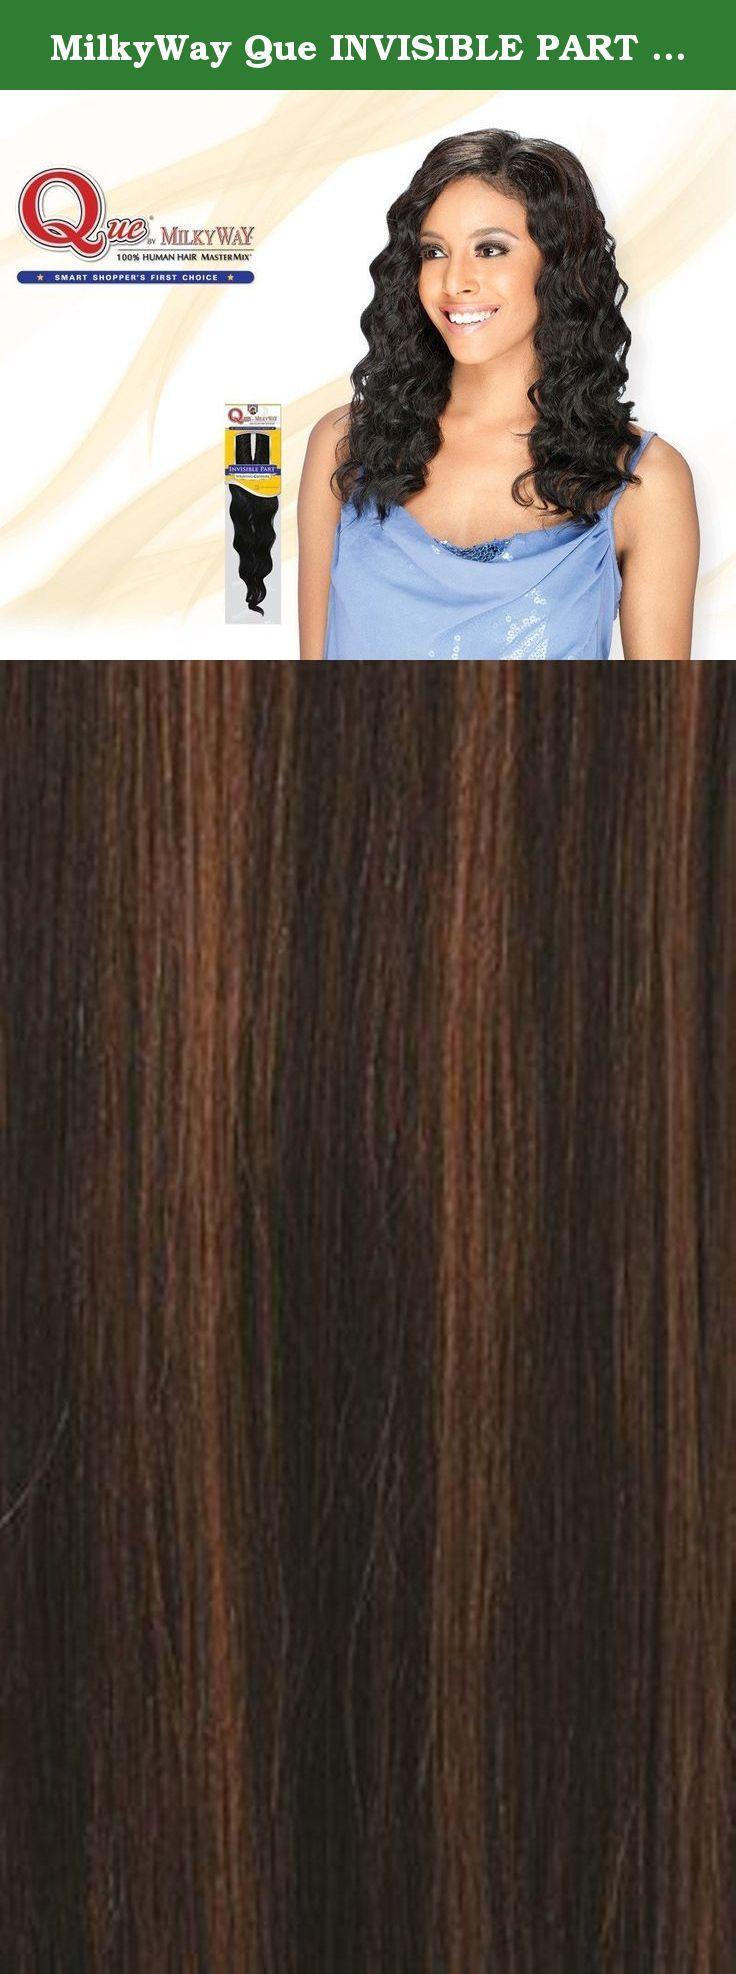 MilkyWay Que INVISIBLE PART WEAVING CLOSURE Human Hair MasterMix - LOOSE DEEP 10'' (P4/30). MilkyWay Que INVISIBLE PART WEAVING CLOSURE Human Hair MasterMix - LOOSE DEEP 10''.